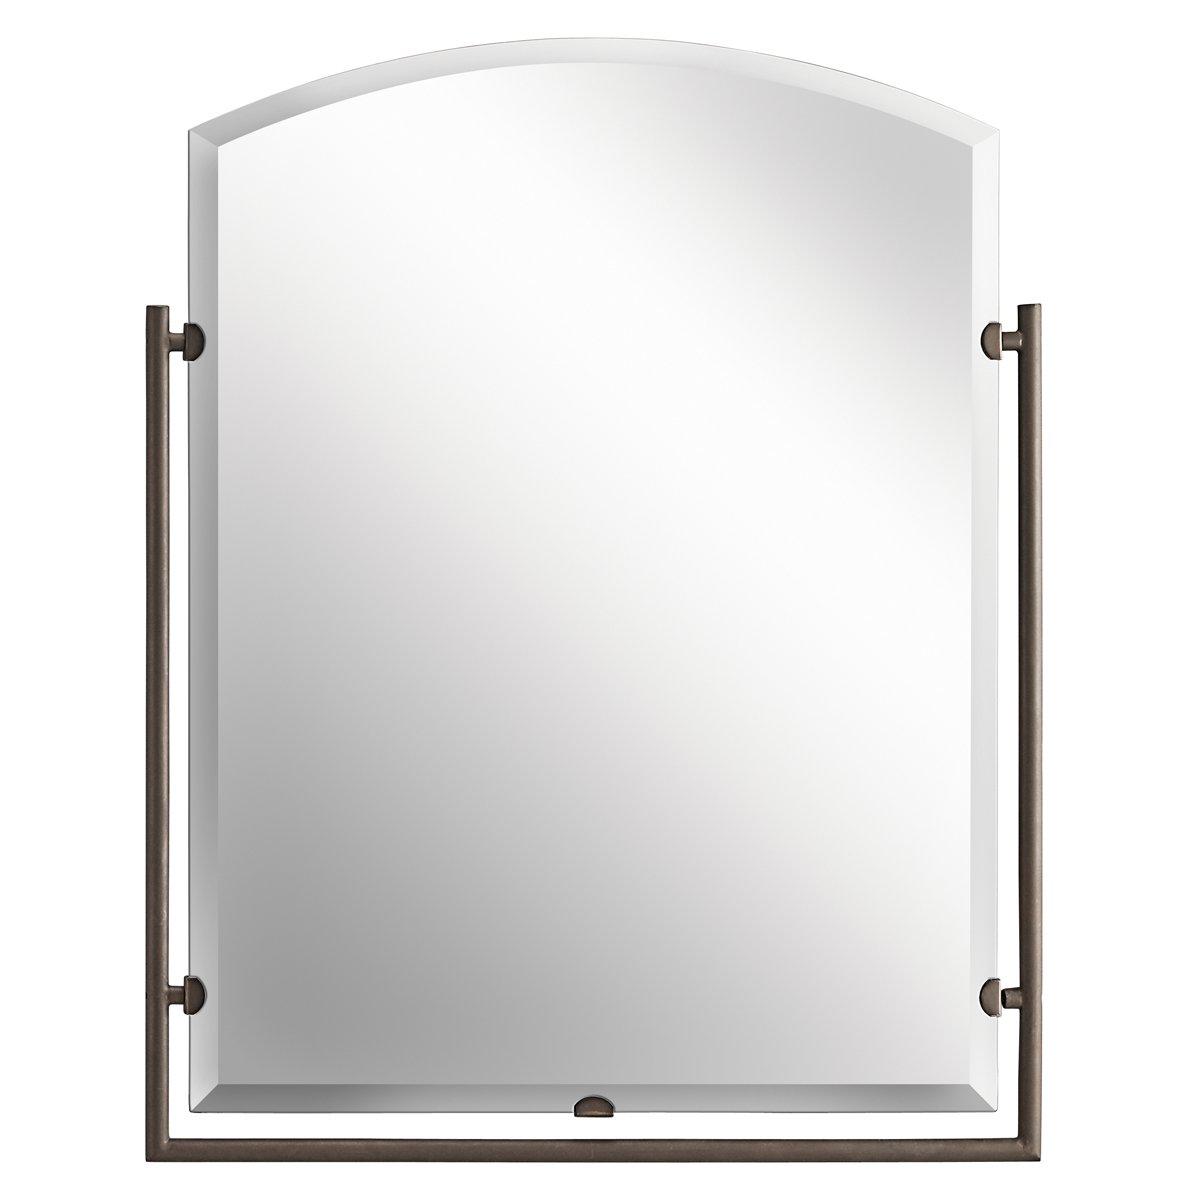 amazon com kichler 41056ni mirror home kitchen